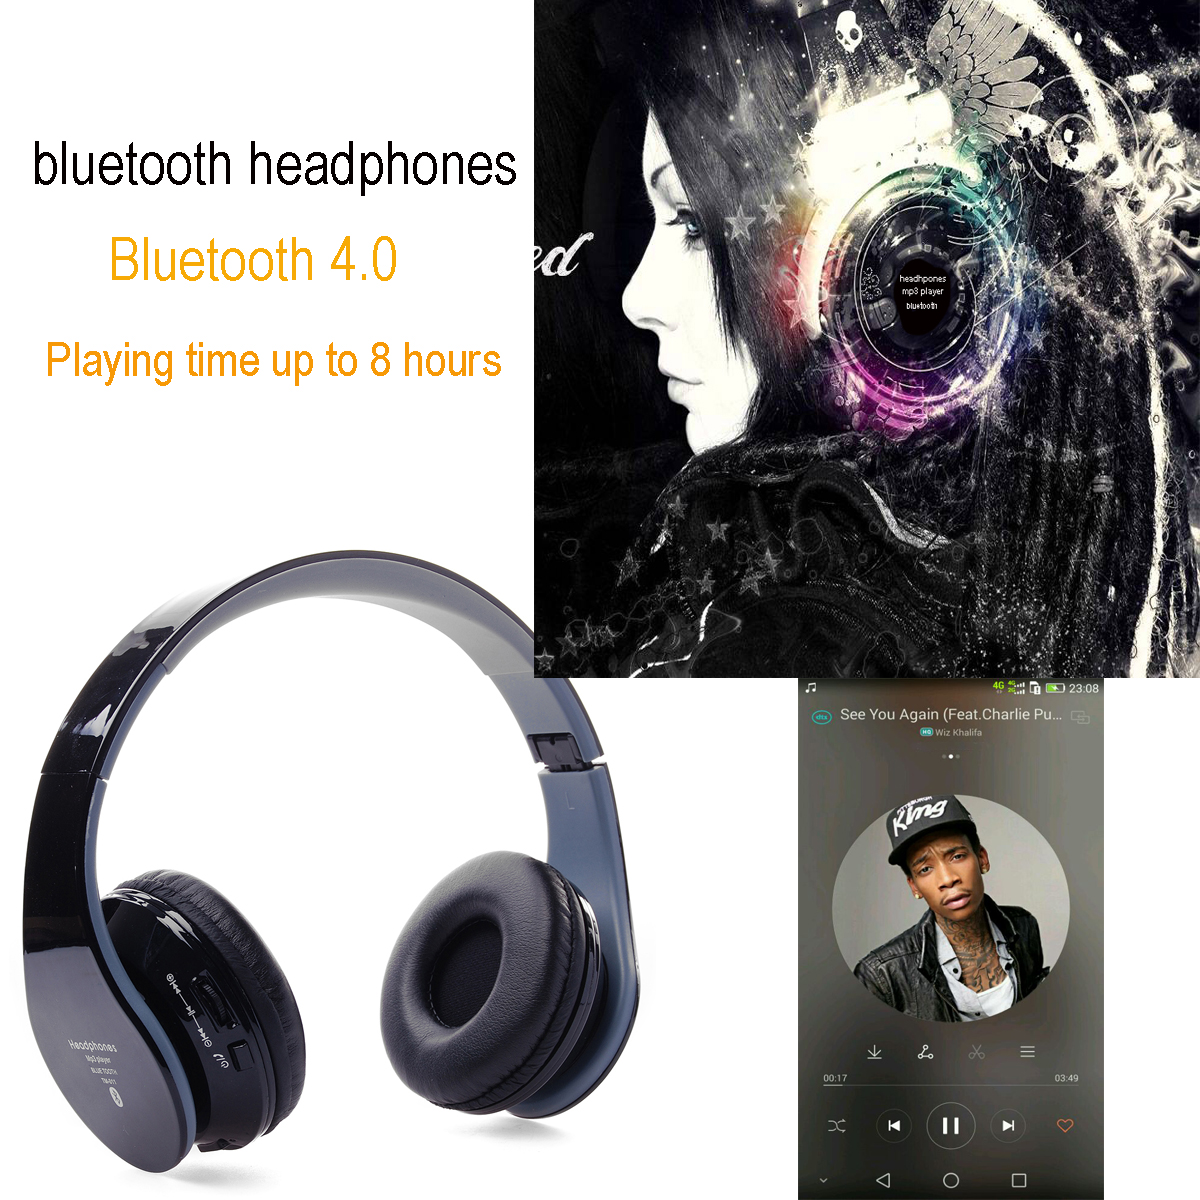 Wireless Bluetooth HandFree Headset Headphone Earphone for iPhone Samsung IP116(China (Mainland))